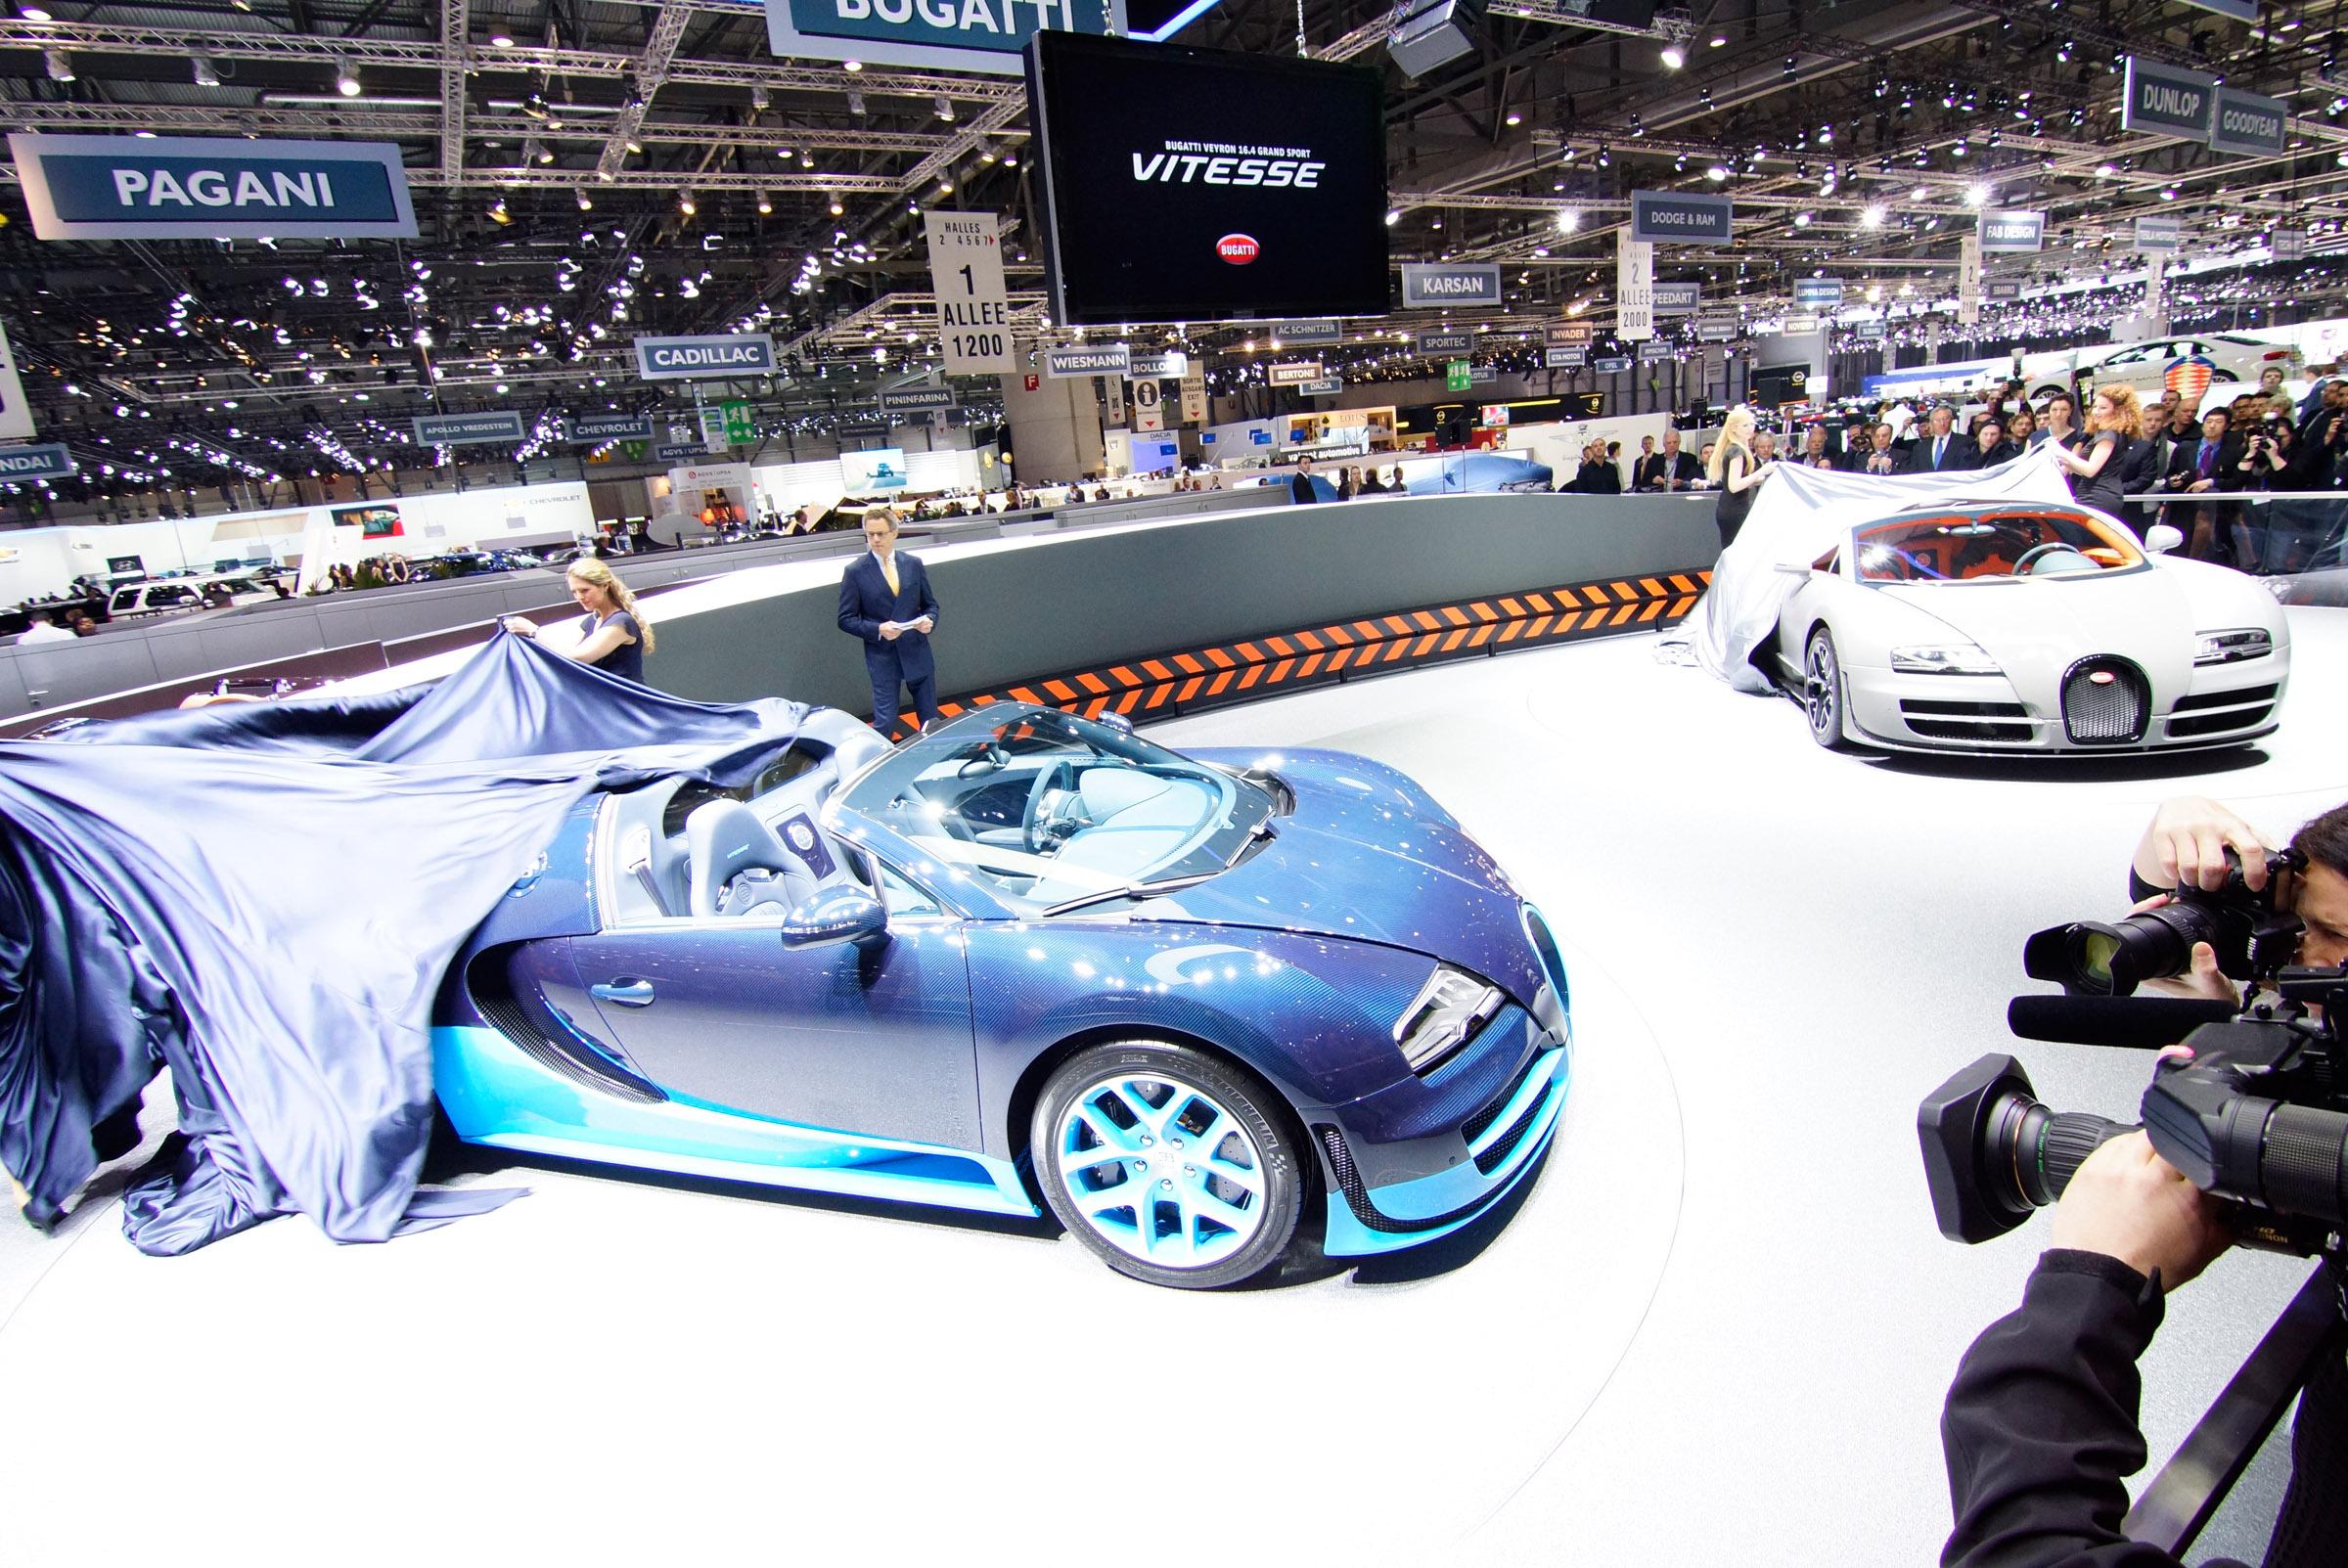 bugatti-veyron-16-4-grand-sport-vitesse-geneva-2012-01 Gorgeous Bugatti Veyron Grand Sport Vitesse Bleu Cars Trend